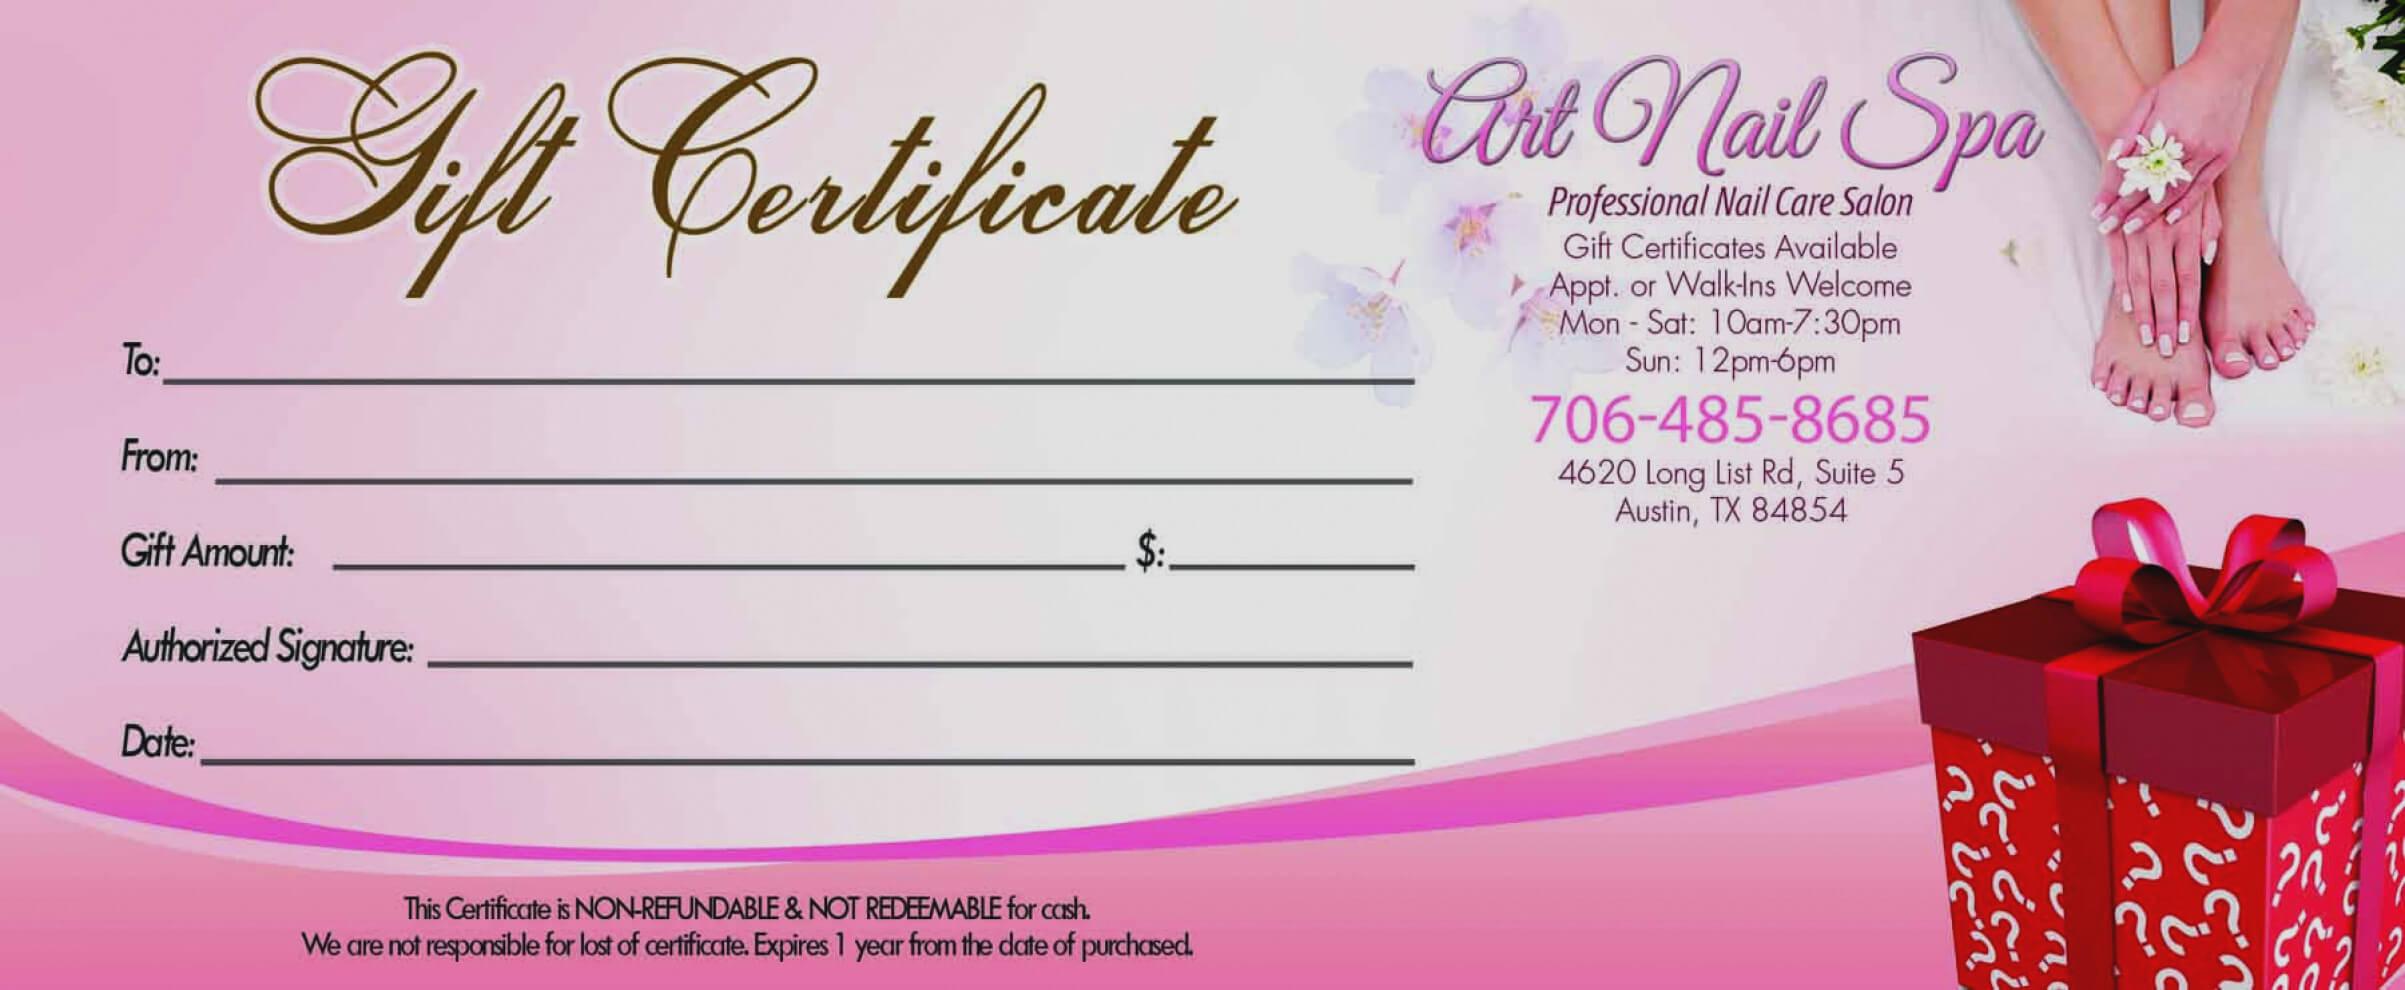 Spa Gift Certi Certificate Sample Templates Free Copy Nail Inside Nail Gift Certificate Template Free